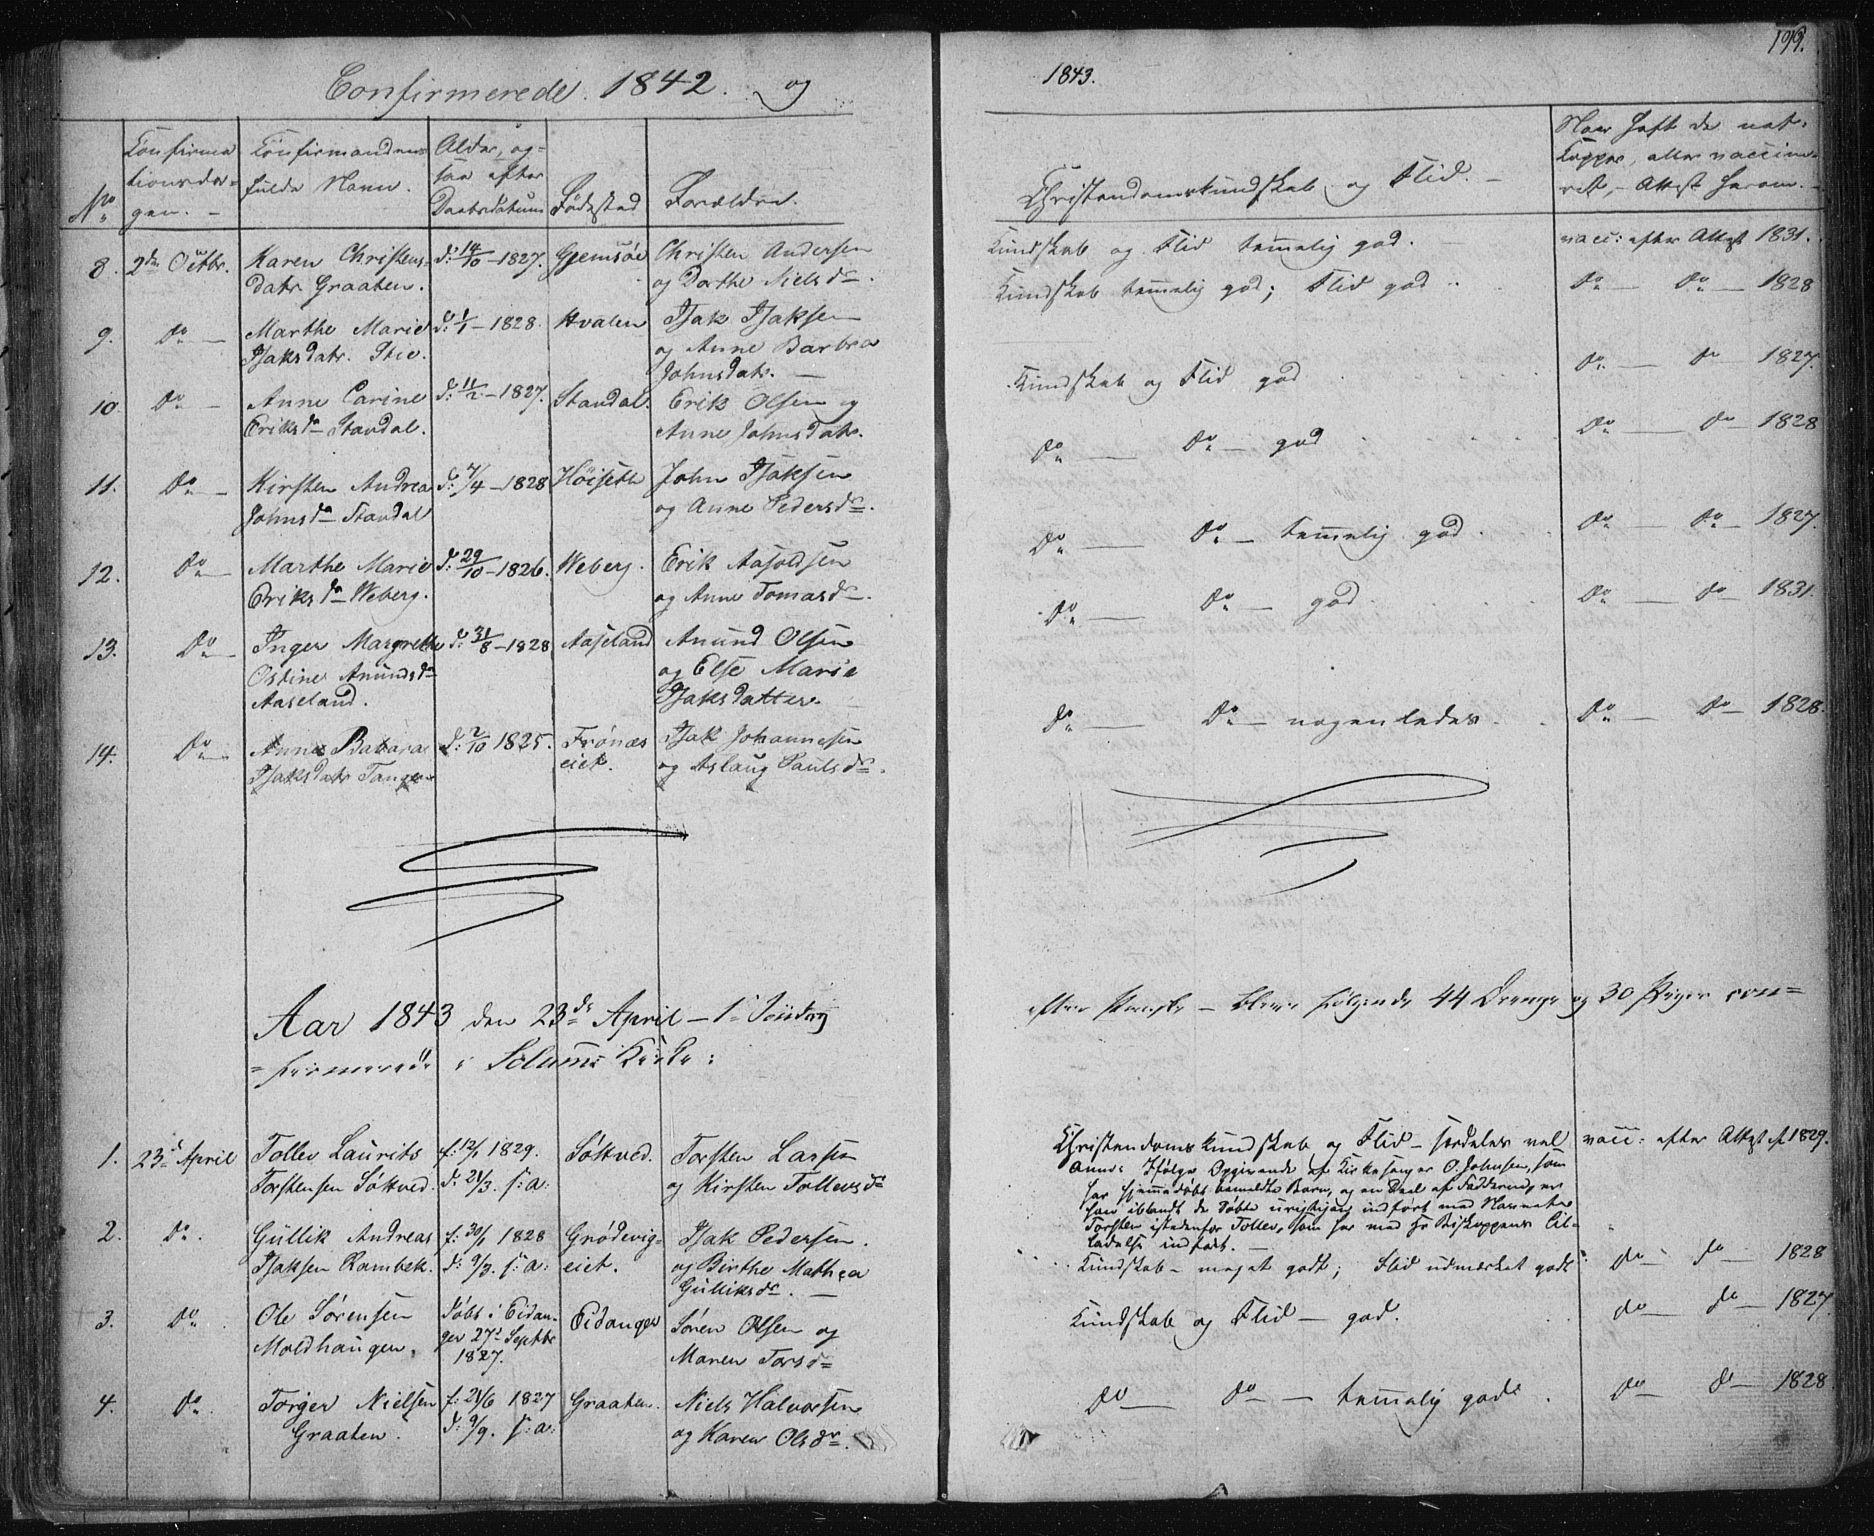 SAKO, Solum kirkebøker, F/Fa/L0005: Ministerialbok nr. I 5, 1833-1843, s. 199